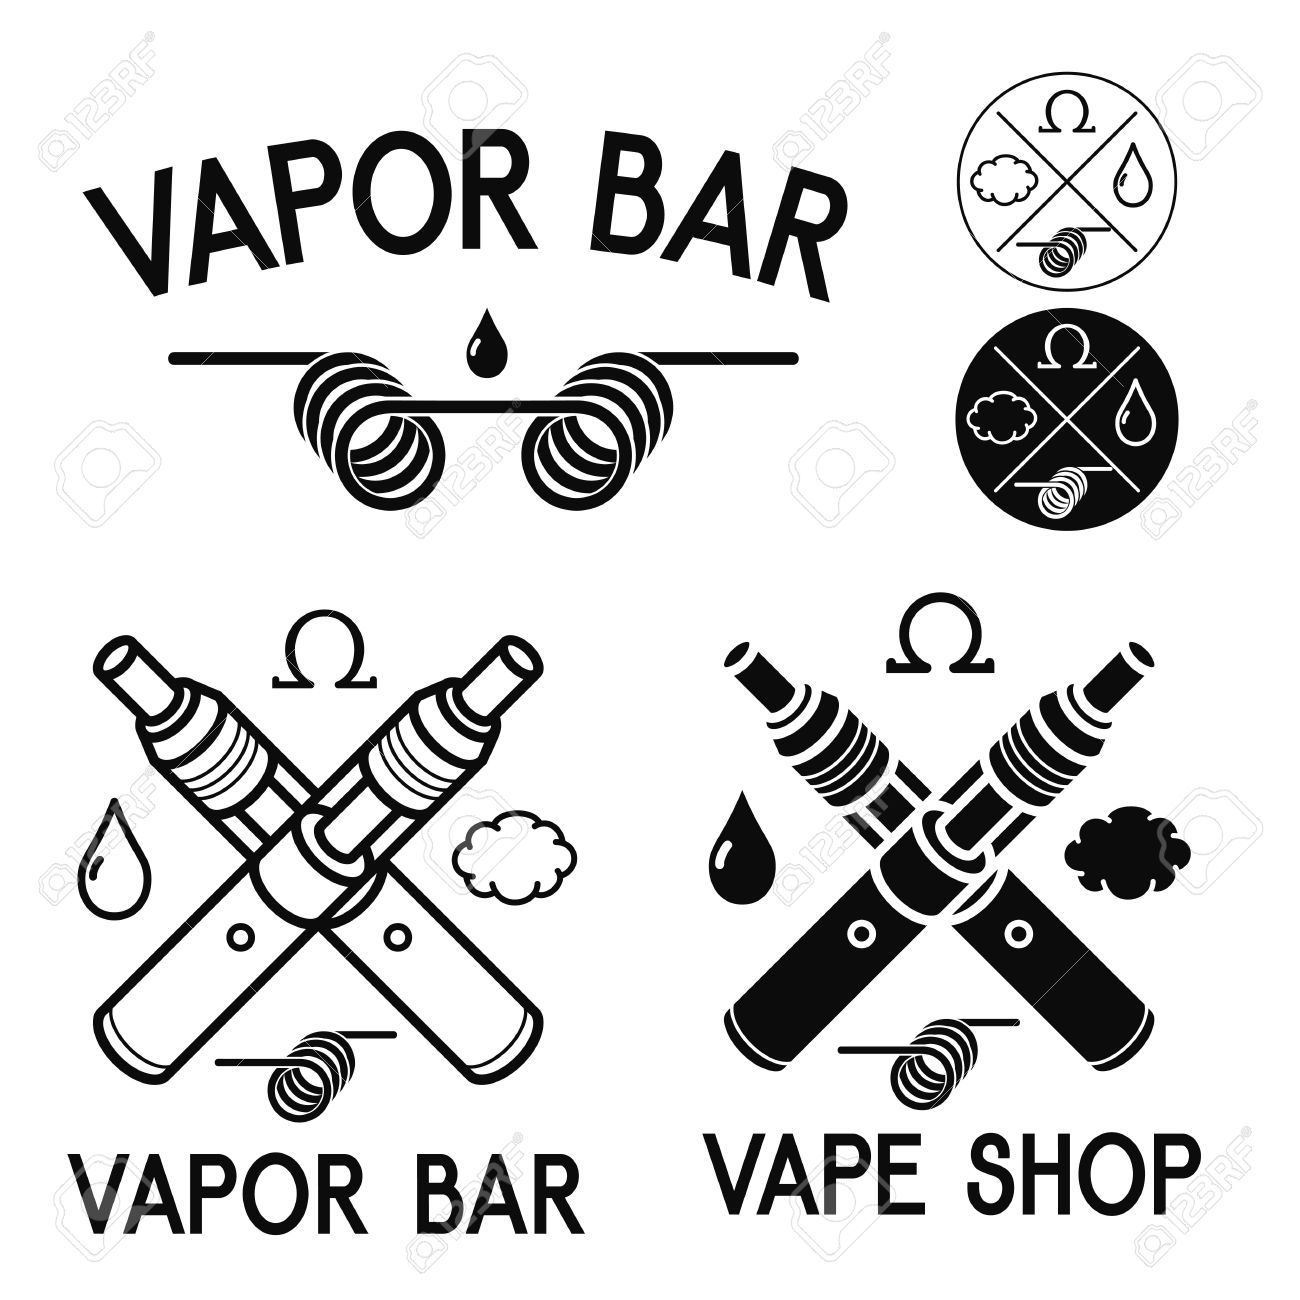 vape shop and bar isolated logos on white background royalty free